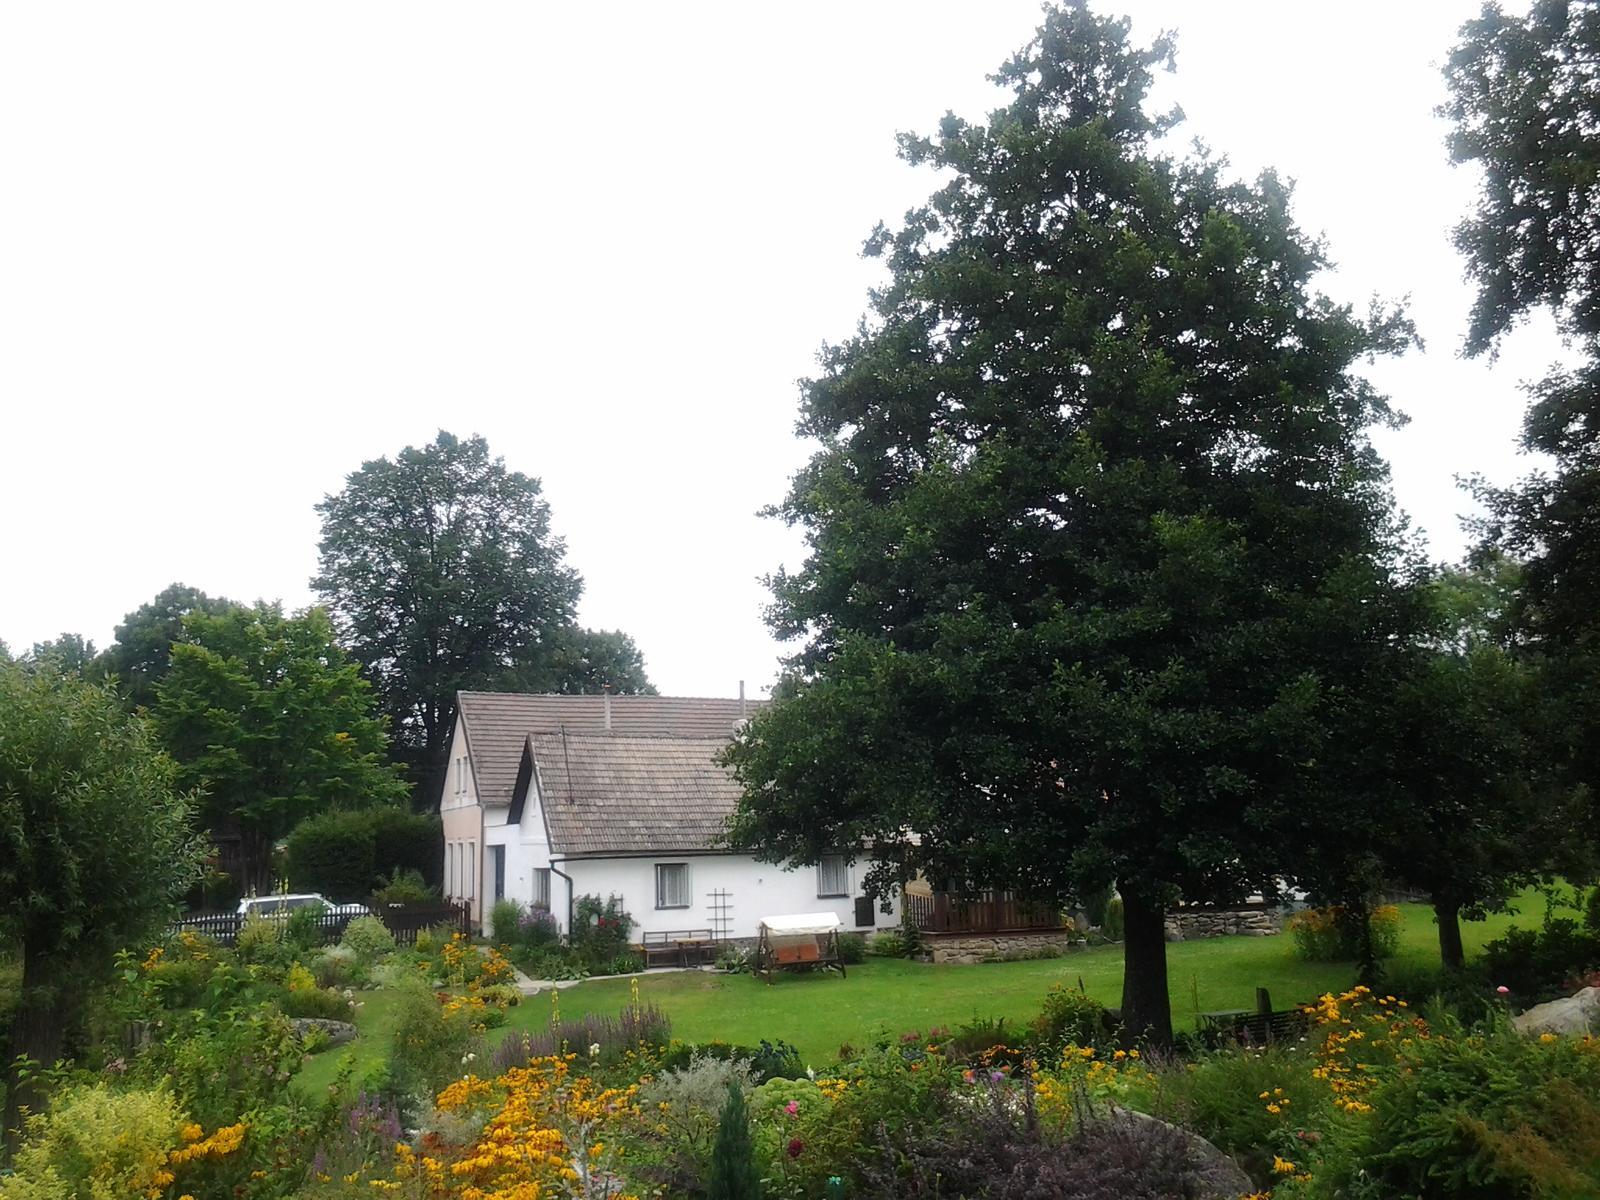 Jihočeská venkovská zahrada. - Královna zahrady-olše lepkavá.